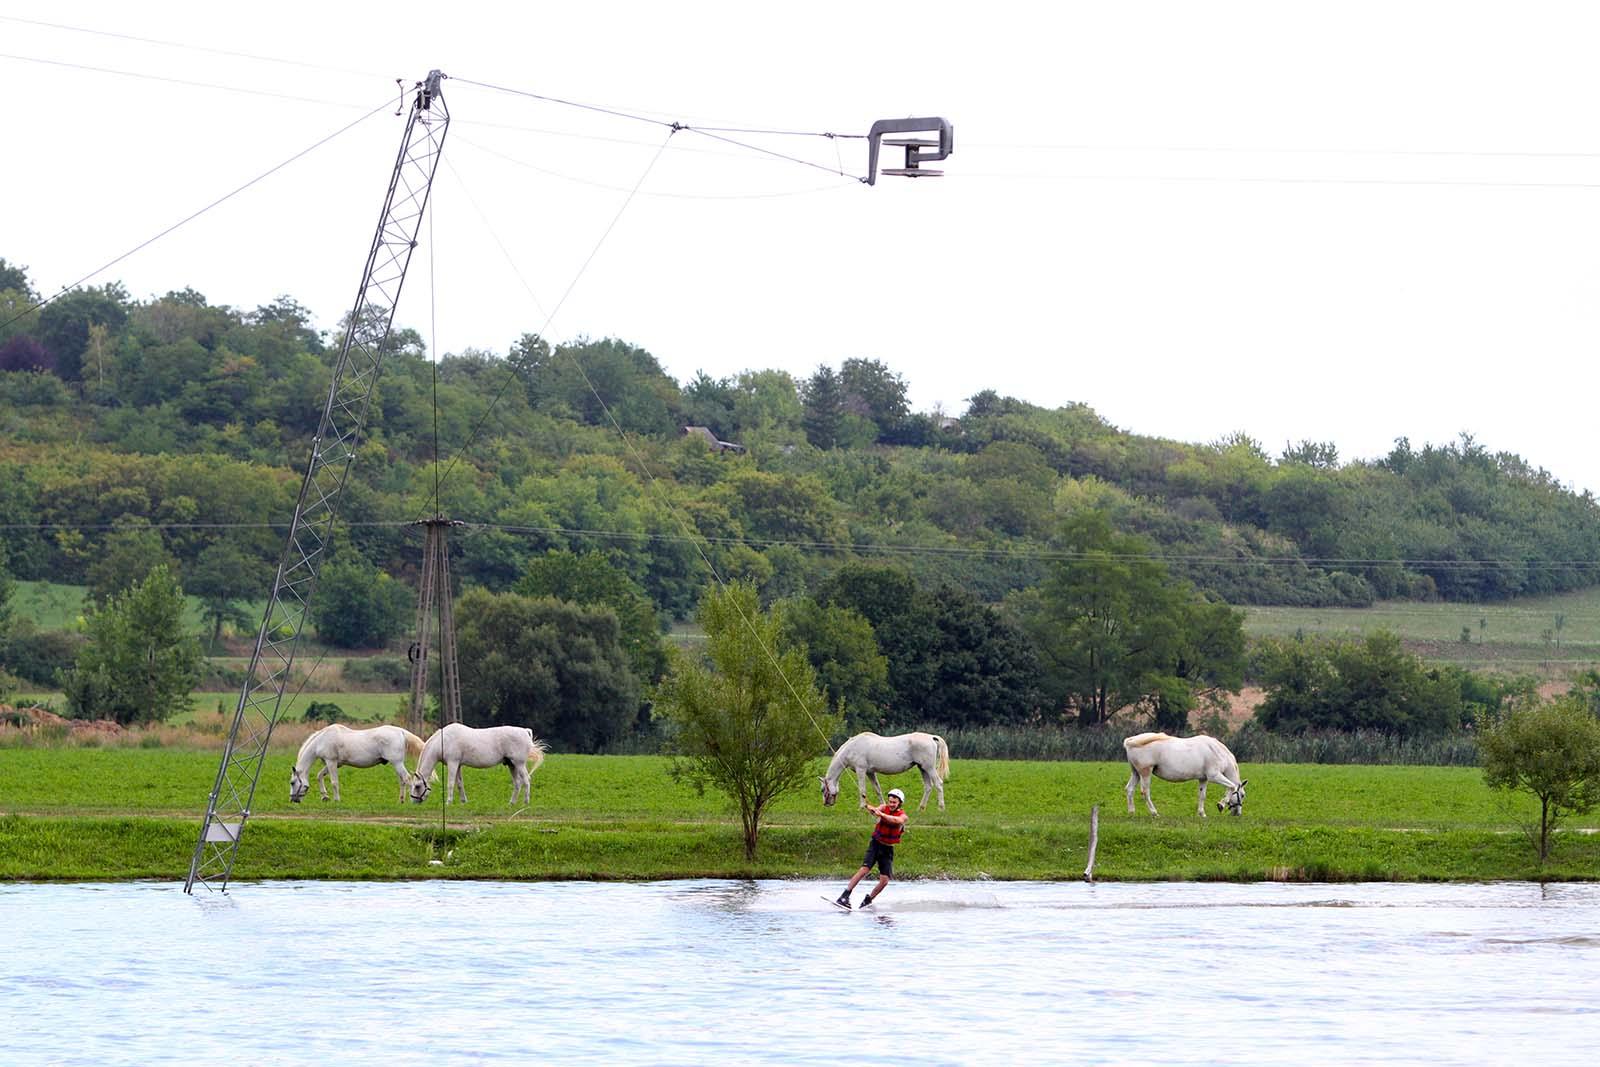 Berek wakeboard Pécs kanyar lovakkal